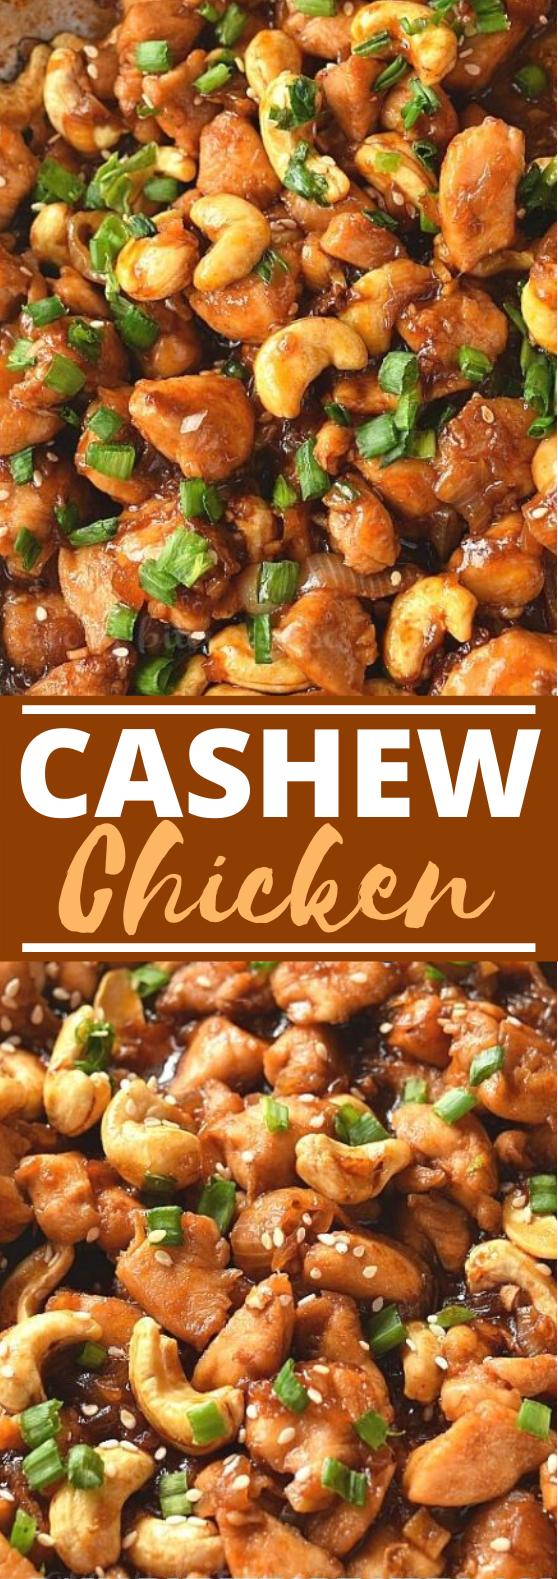 Cashew Chicken Stir Fry #chicken #dinner #stirfry #lowcarb #lunch